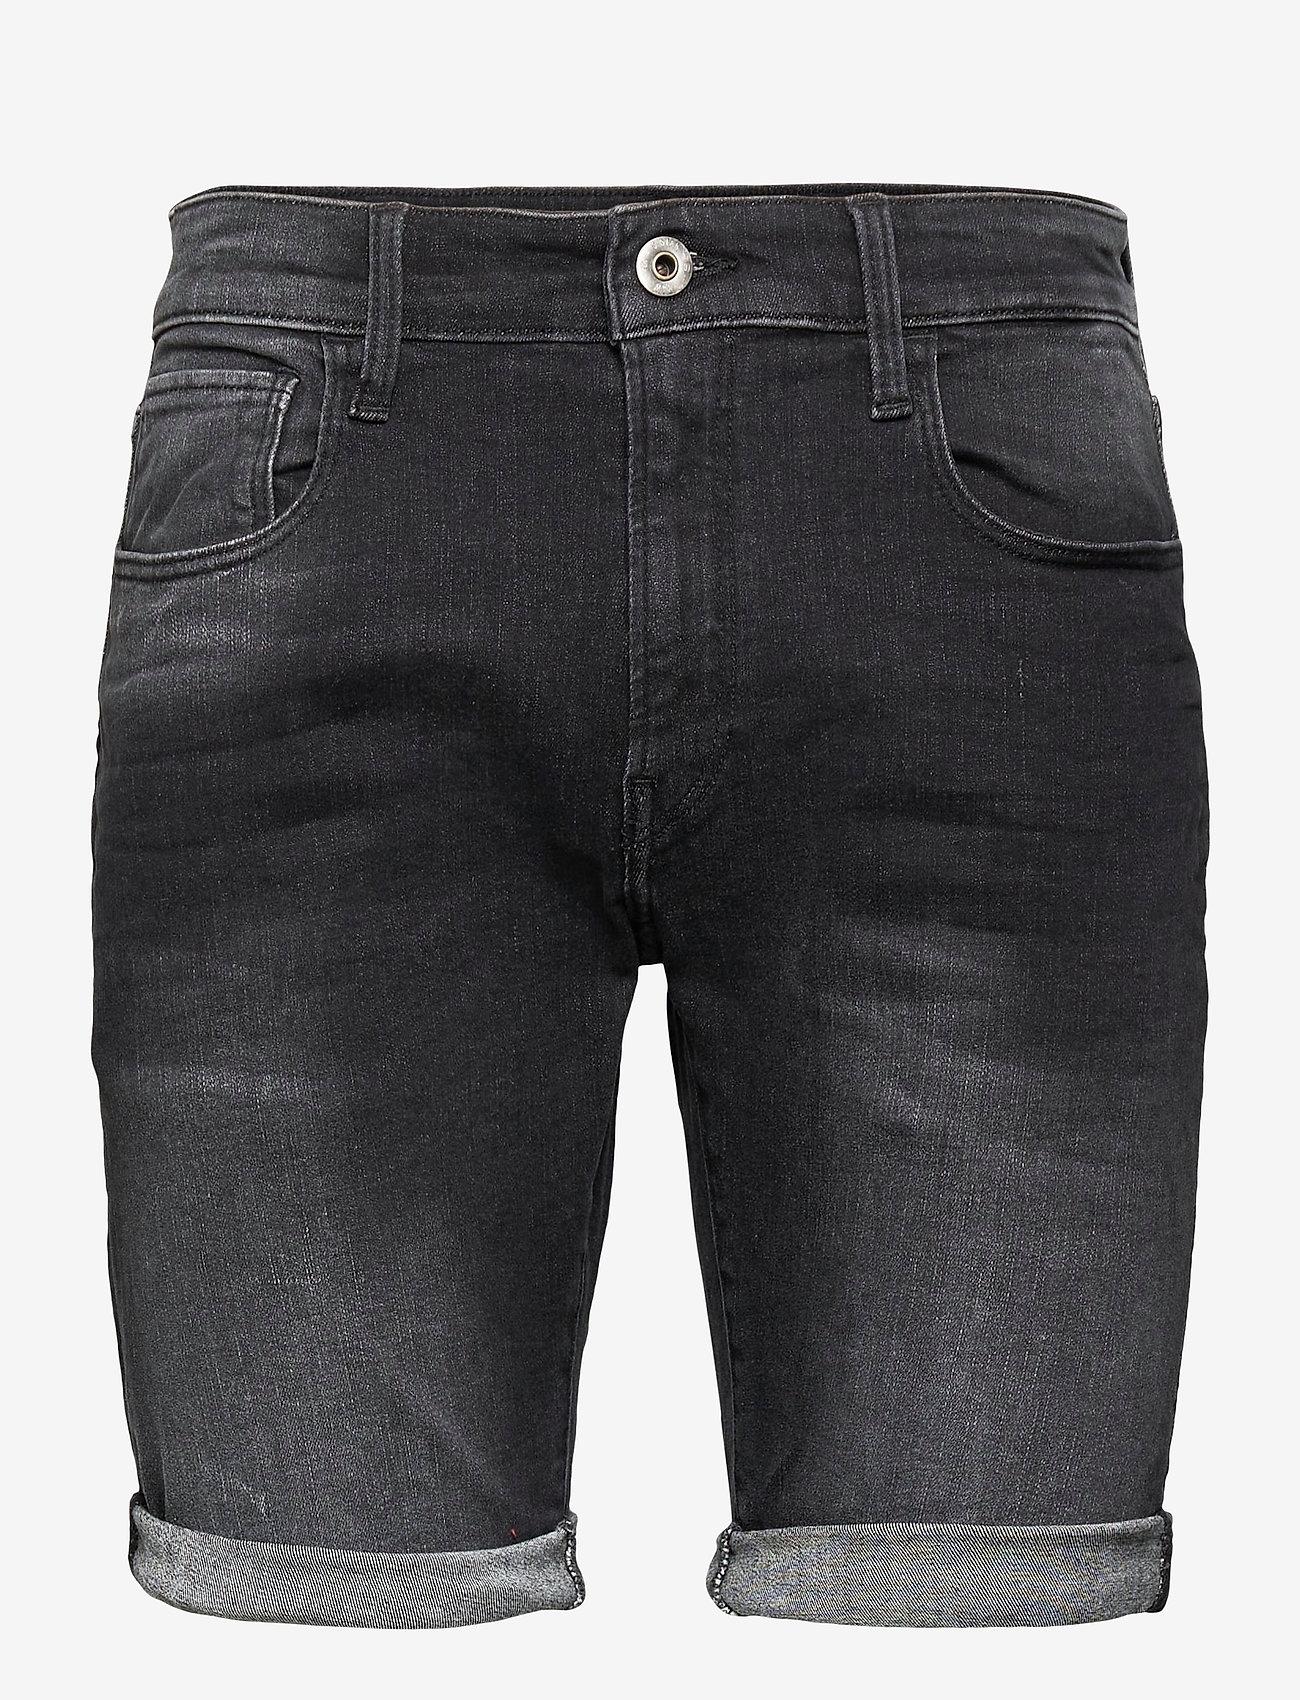 G-star RAW - 3301 Slim short - denim shorts - medium aged grey - 0